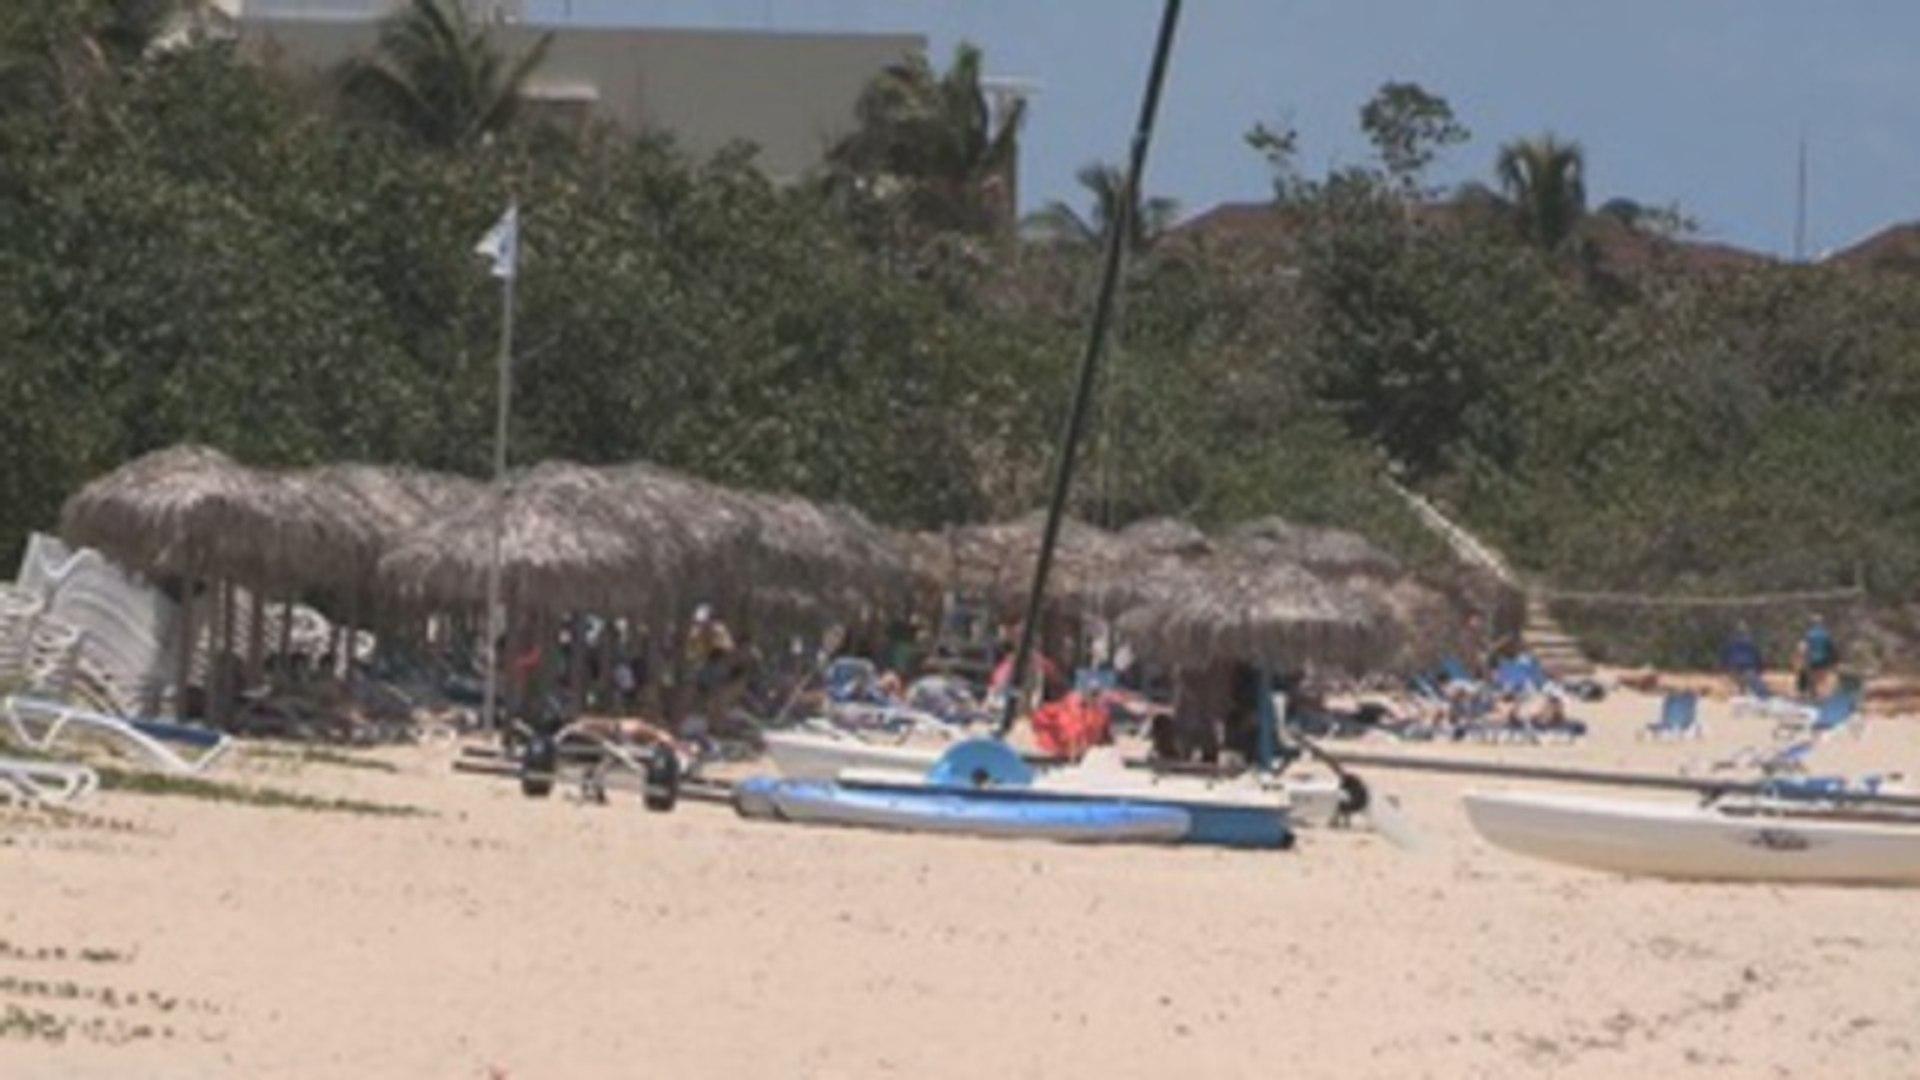 España apoya a compañías hoteleras en Cuba frente a la ley Helms-Burton de EEUU